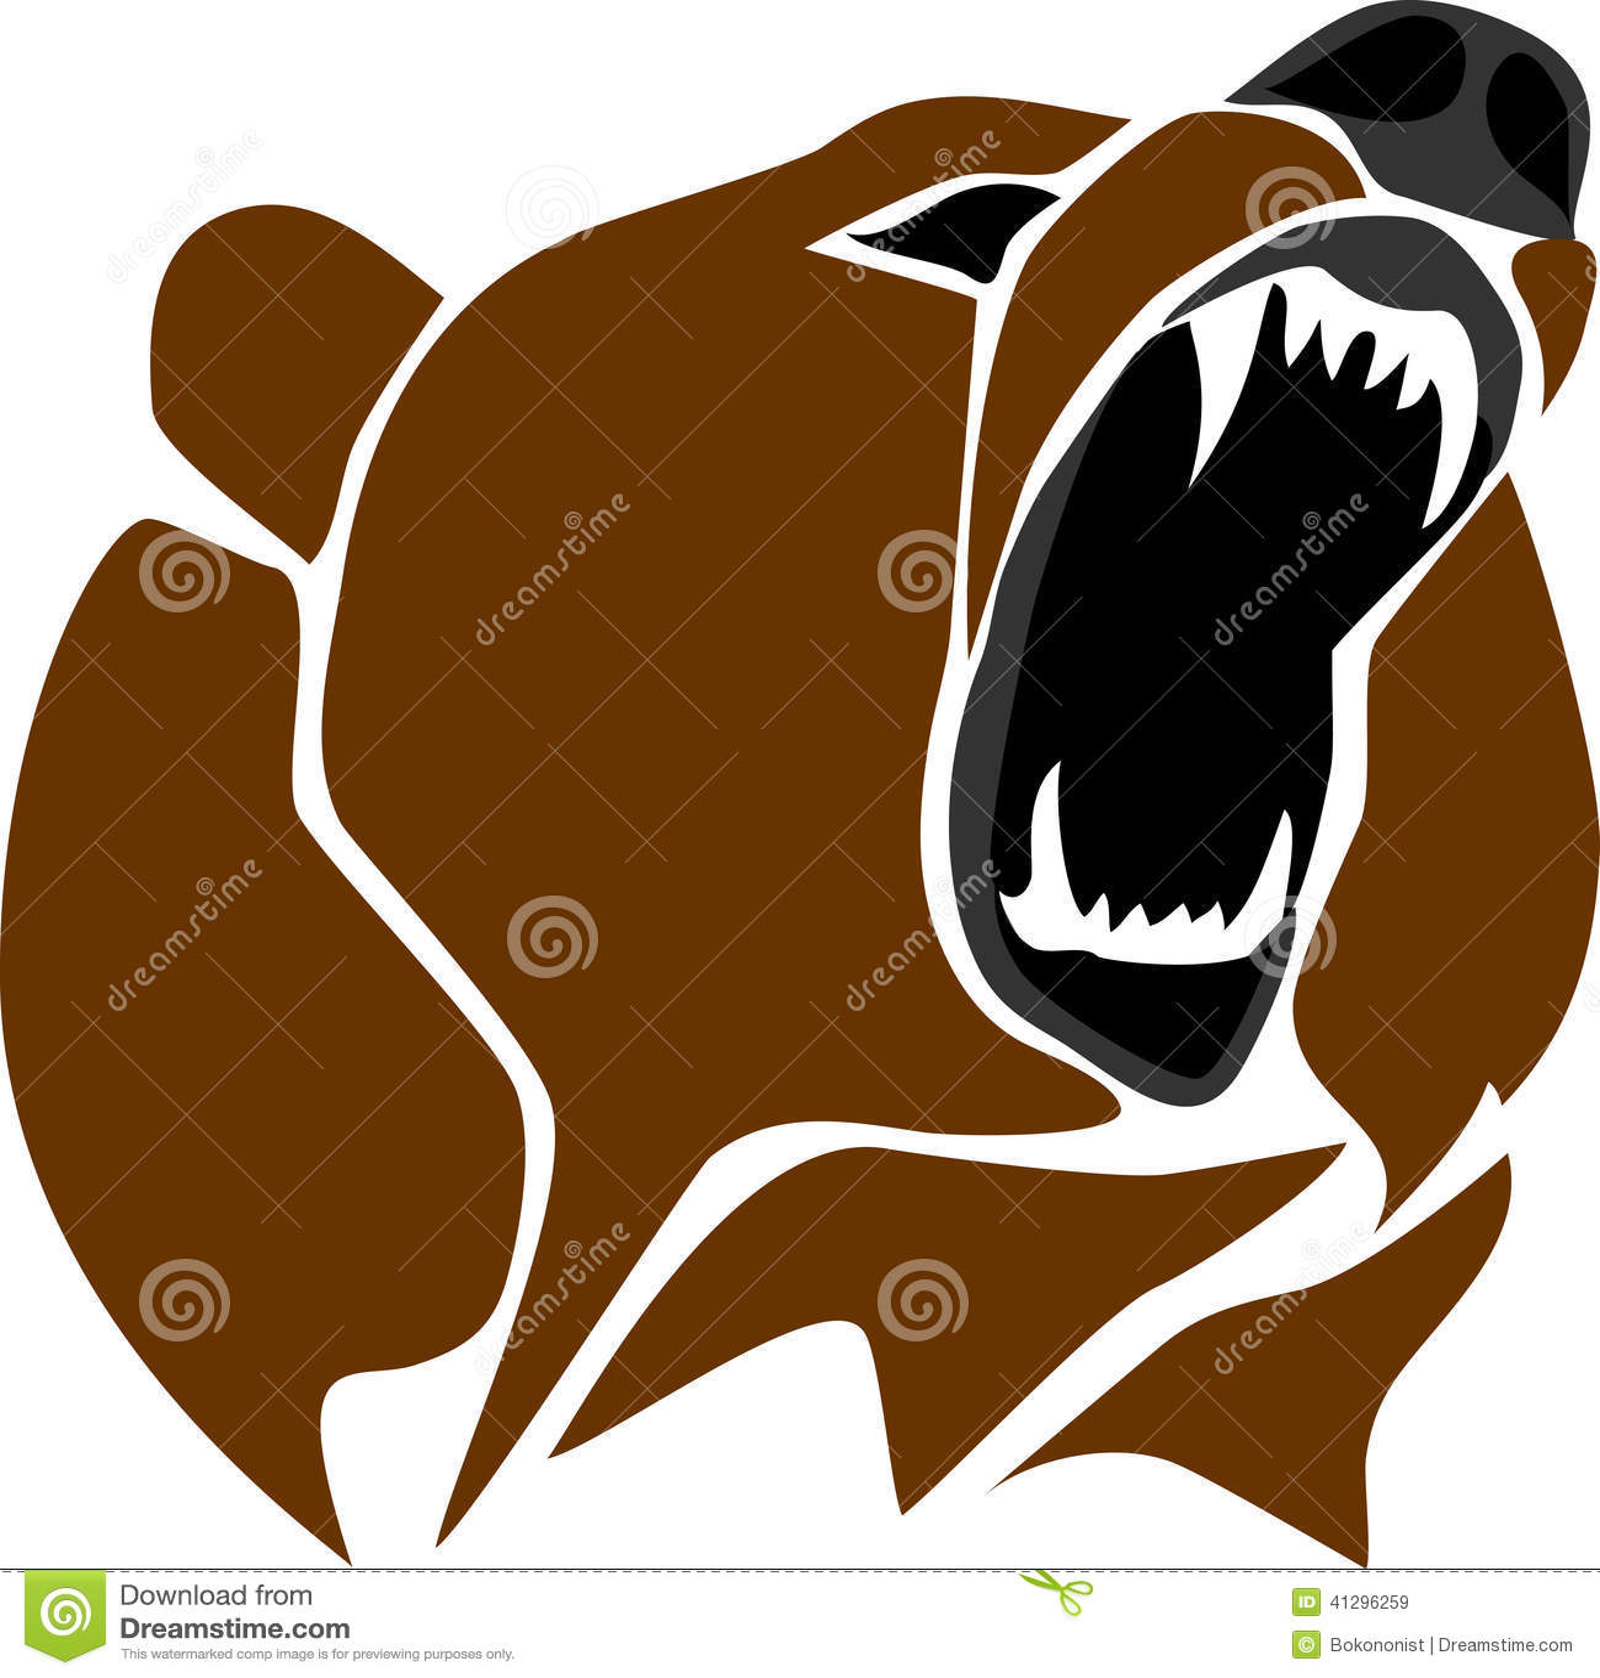 Bear Head Stock Vector - Image: 41296259 Grizzly Bear Face Logo